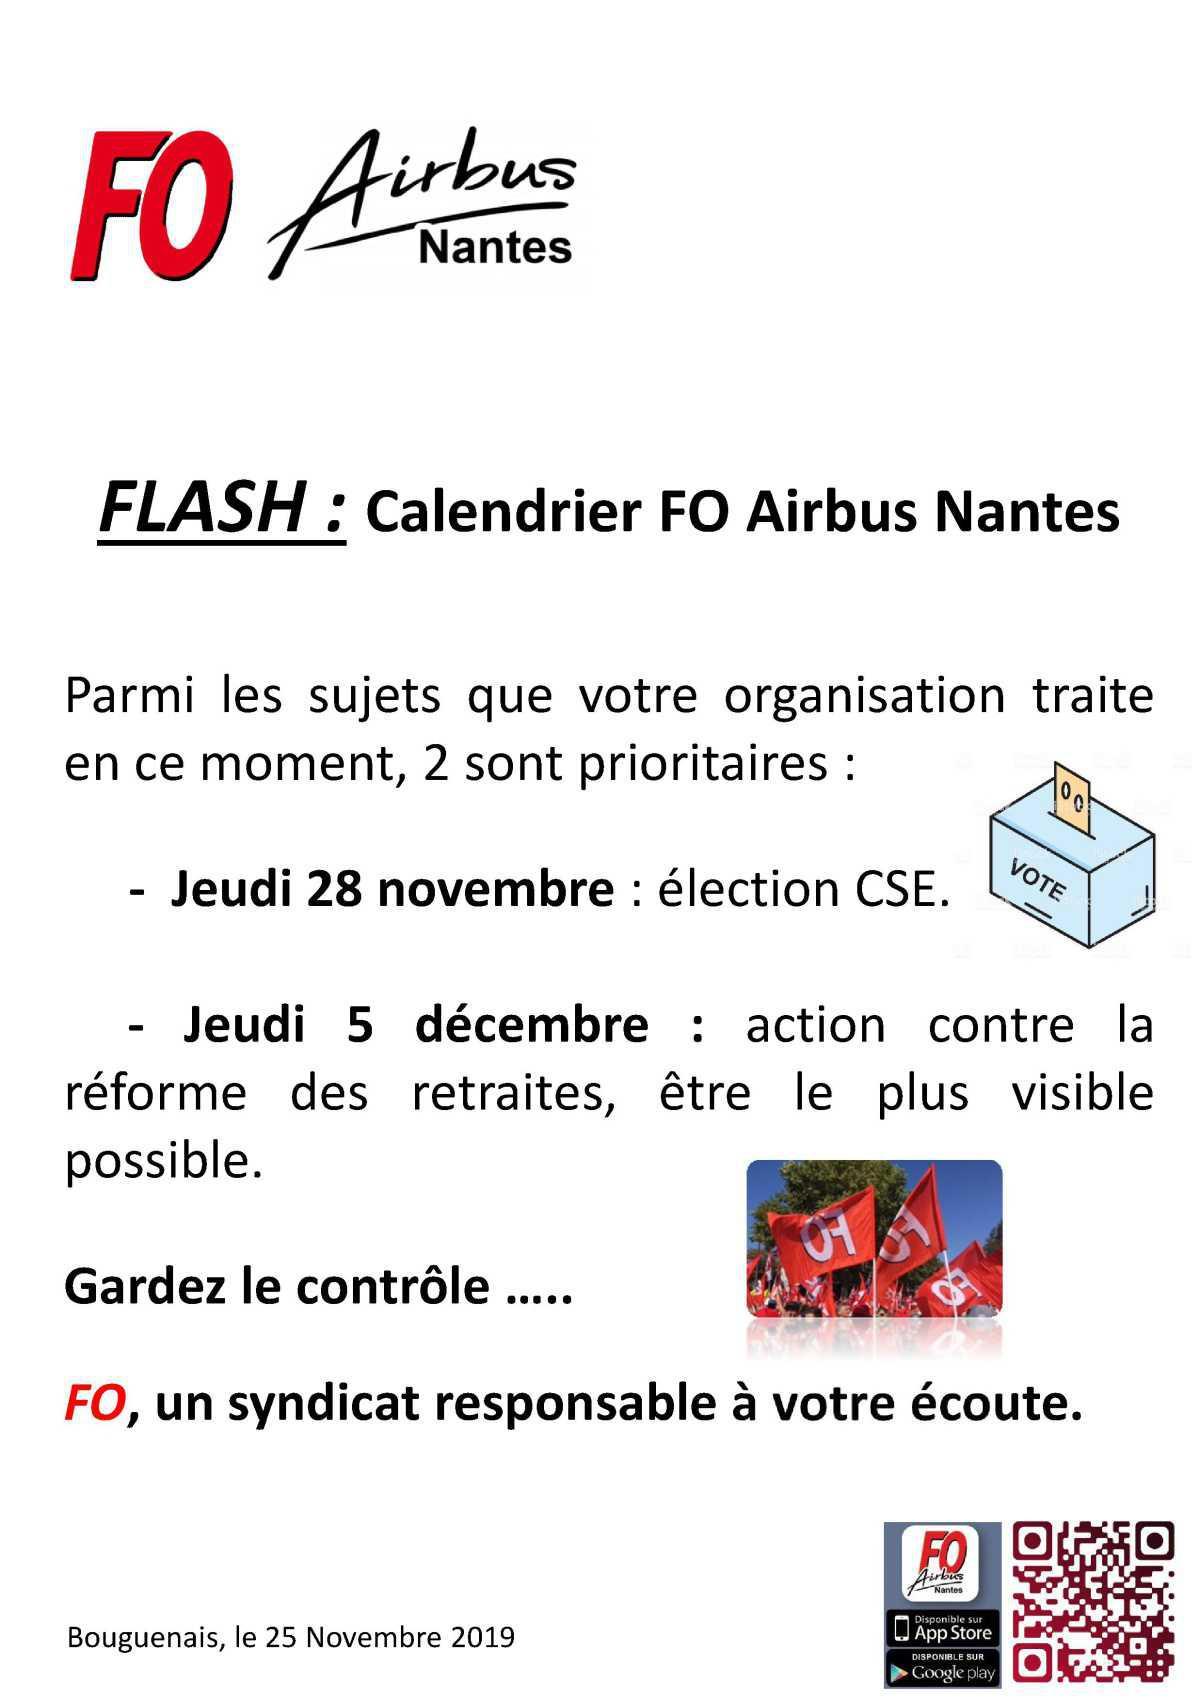 FLASH : Calendrier FO Airbus Nantes.